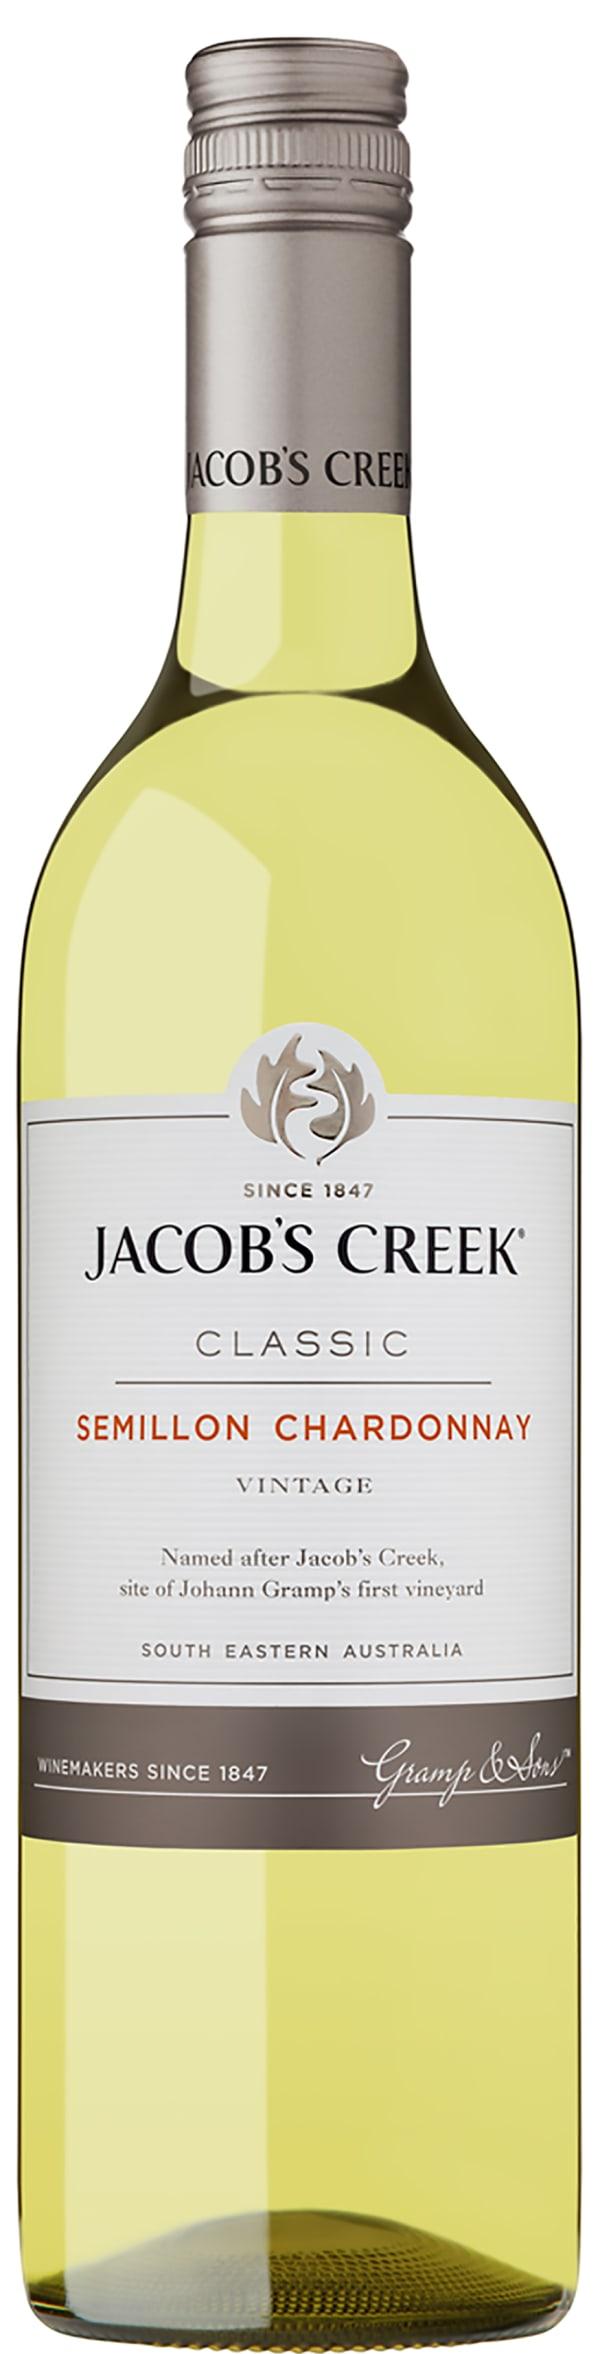 Jacob's Creek Semillon Chardonnay 2017